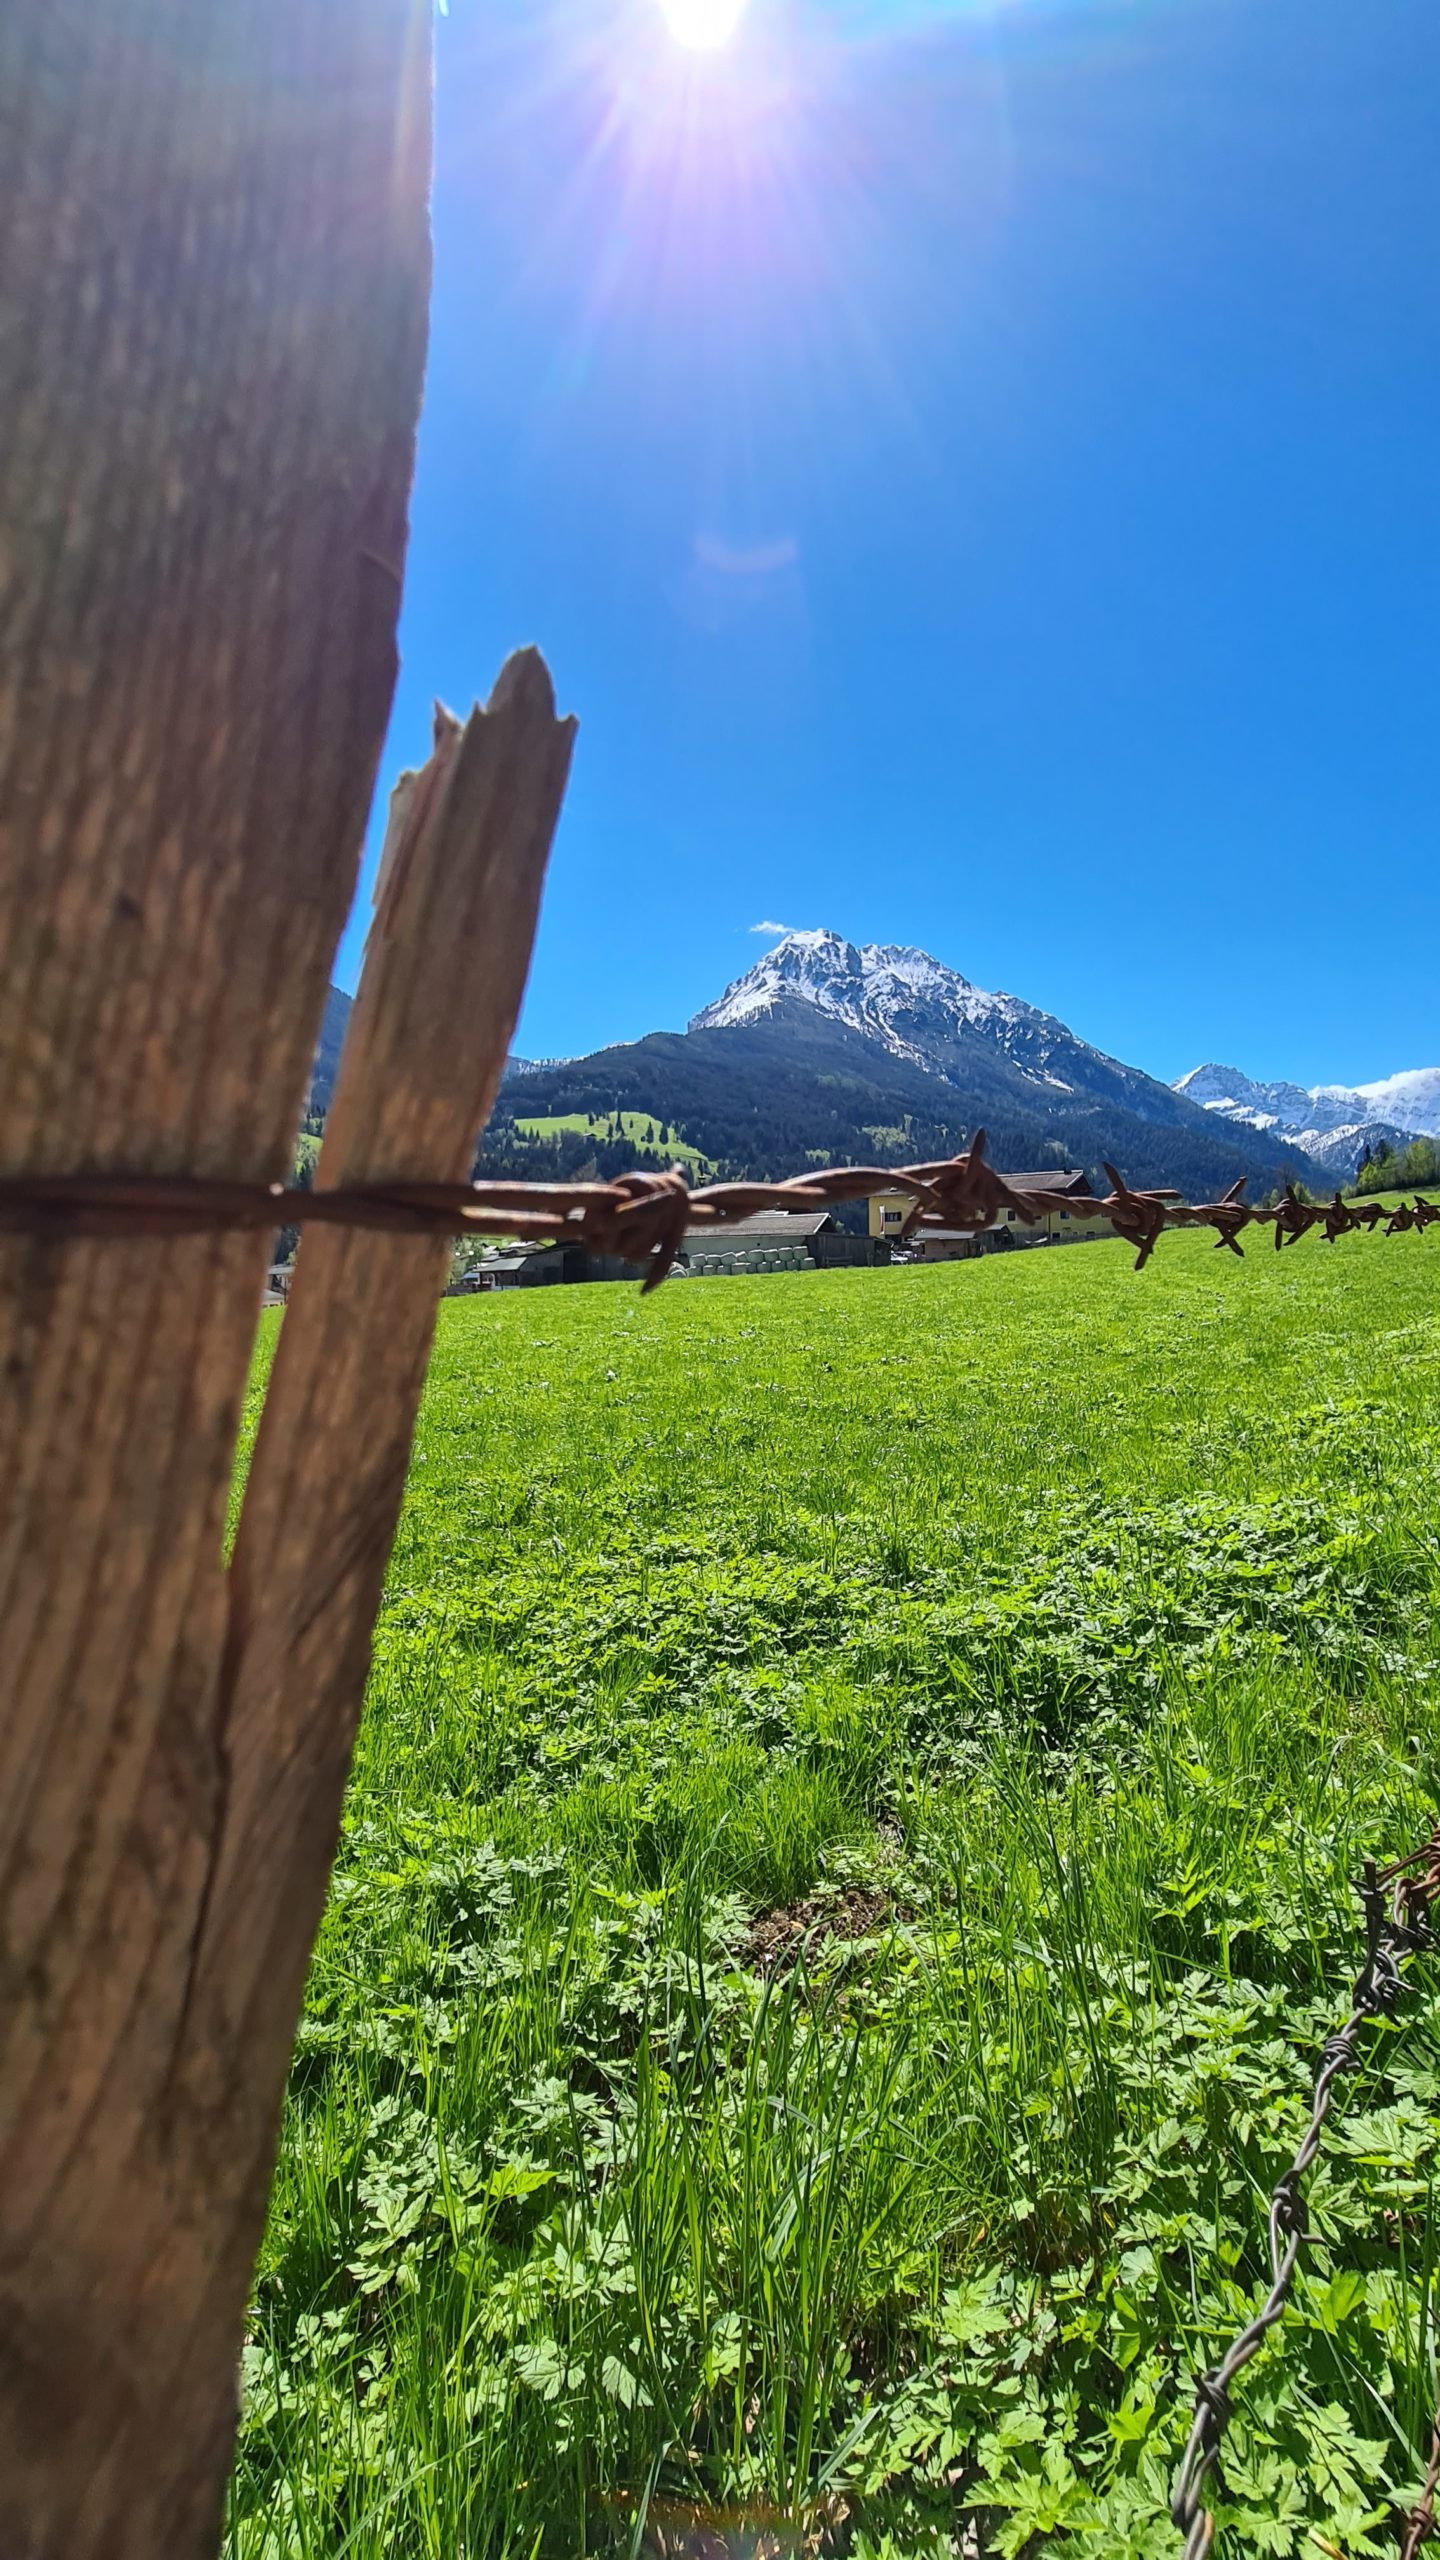 Berg mit Stacheldraht in Wagrain-Kleinarl © Belina Huttegger